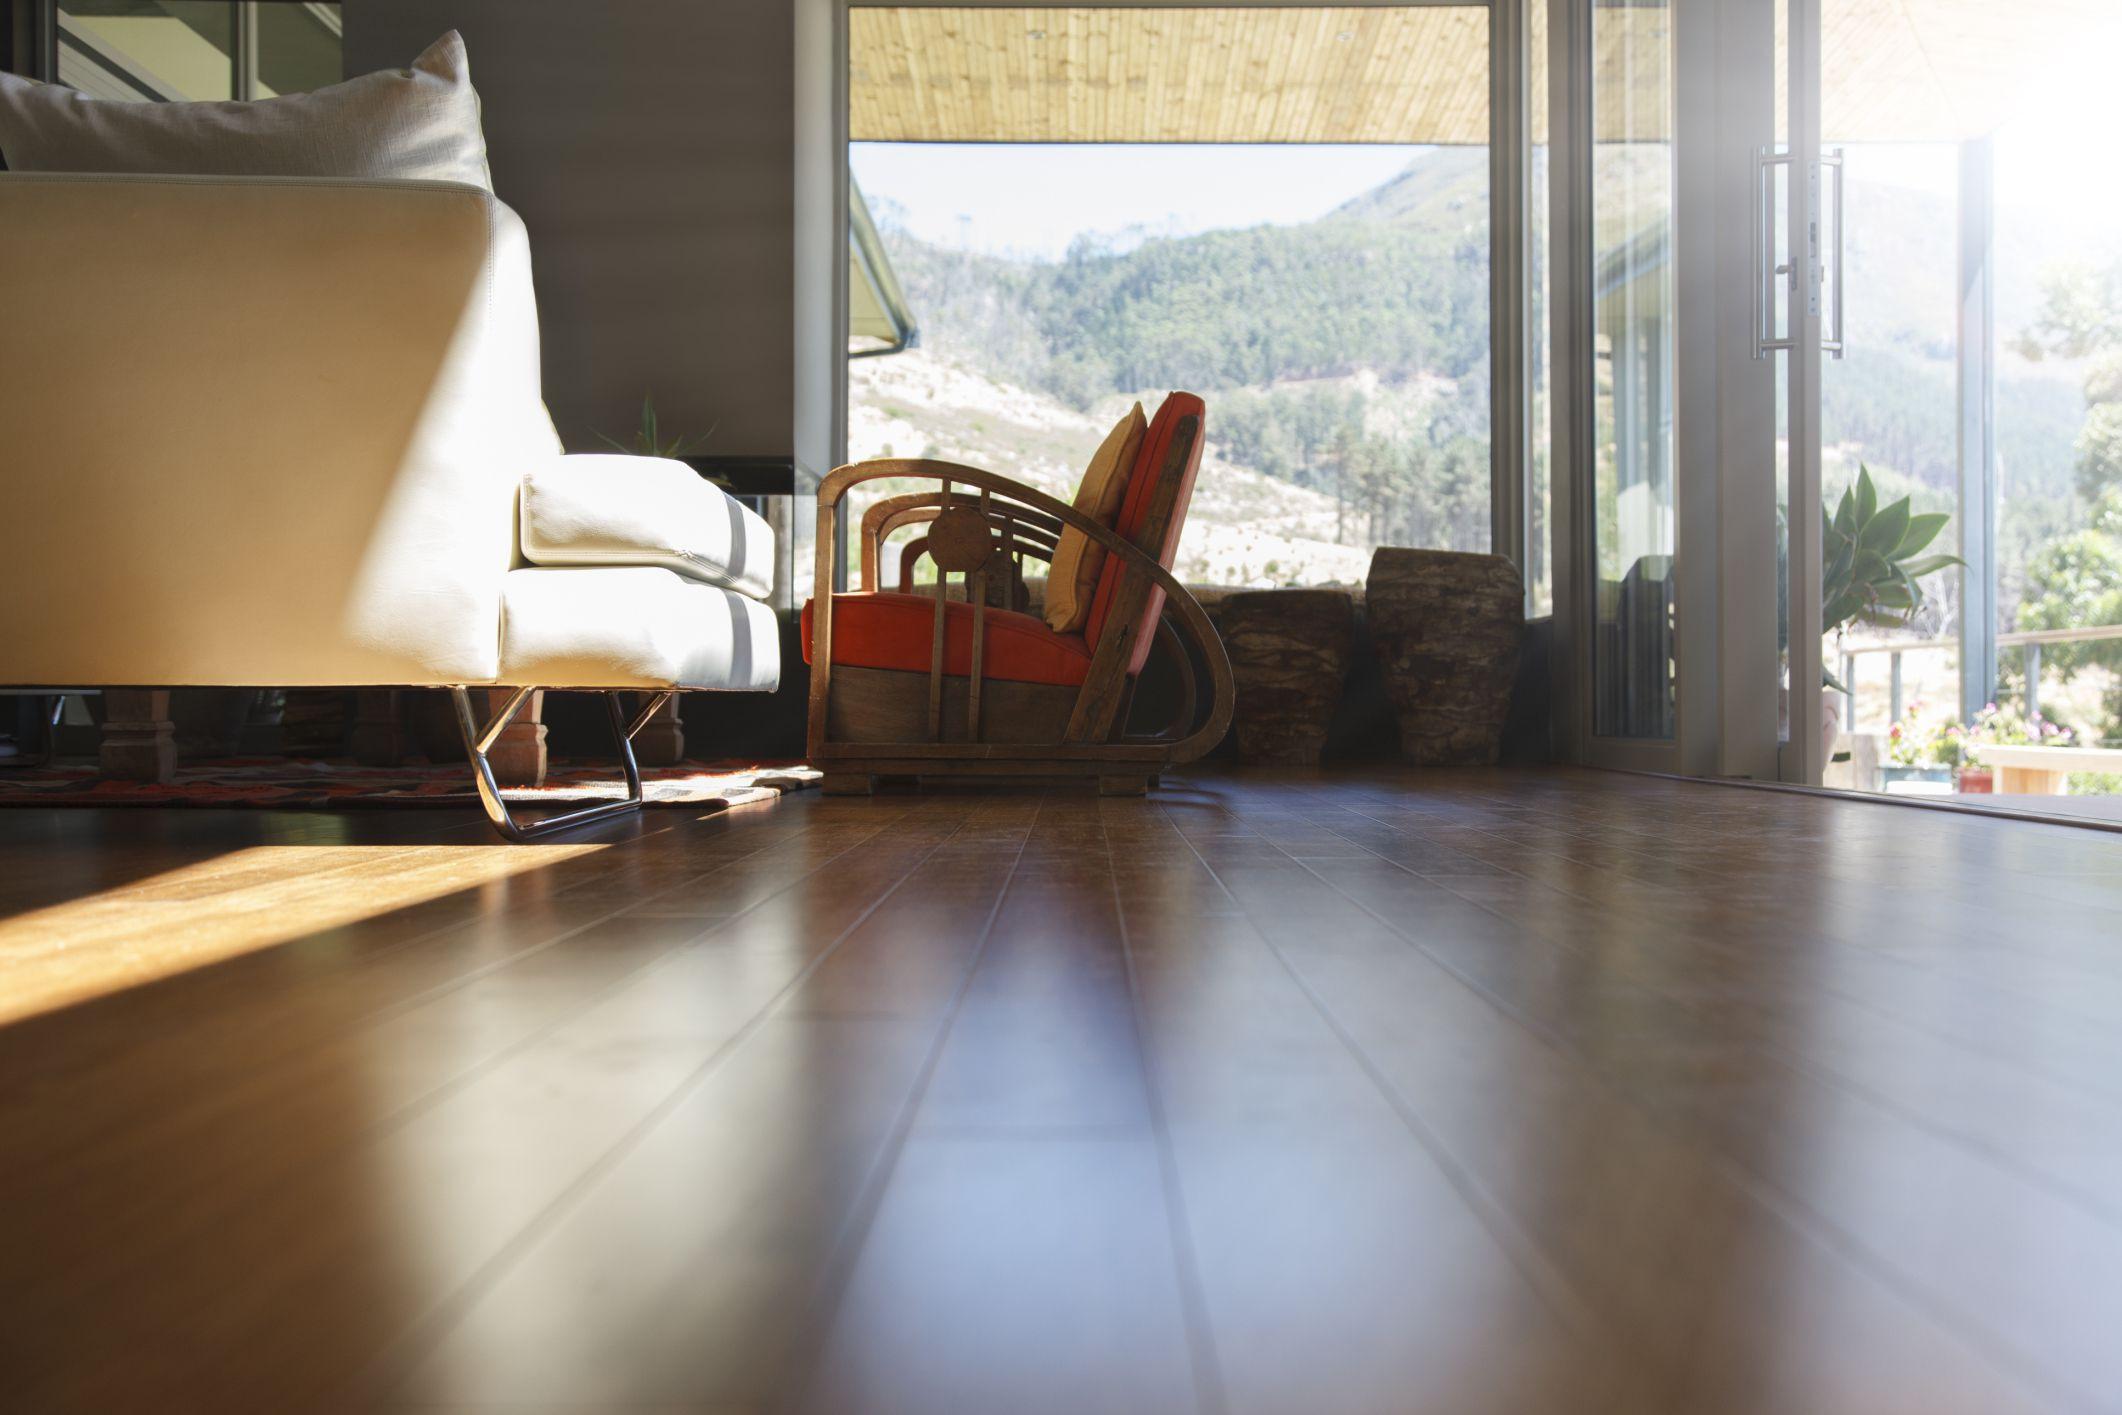 hardwood flooring styles and colors of 5 best luxury vinyl plank floors in exotic hardwood flooring 525439899 56a49d3a3df78cf77283453d